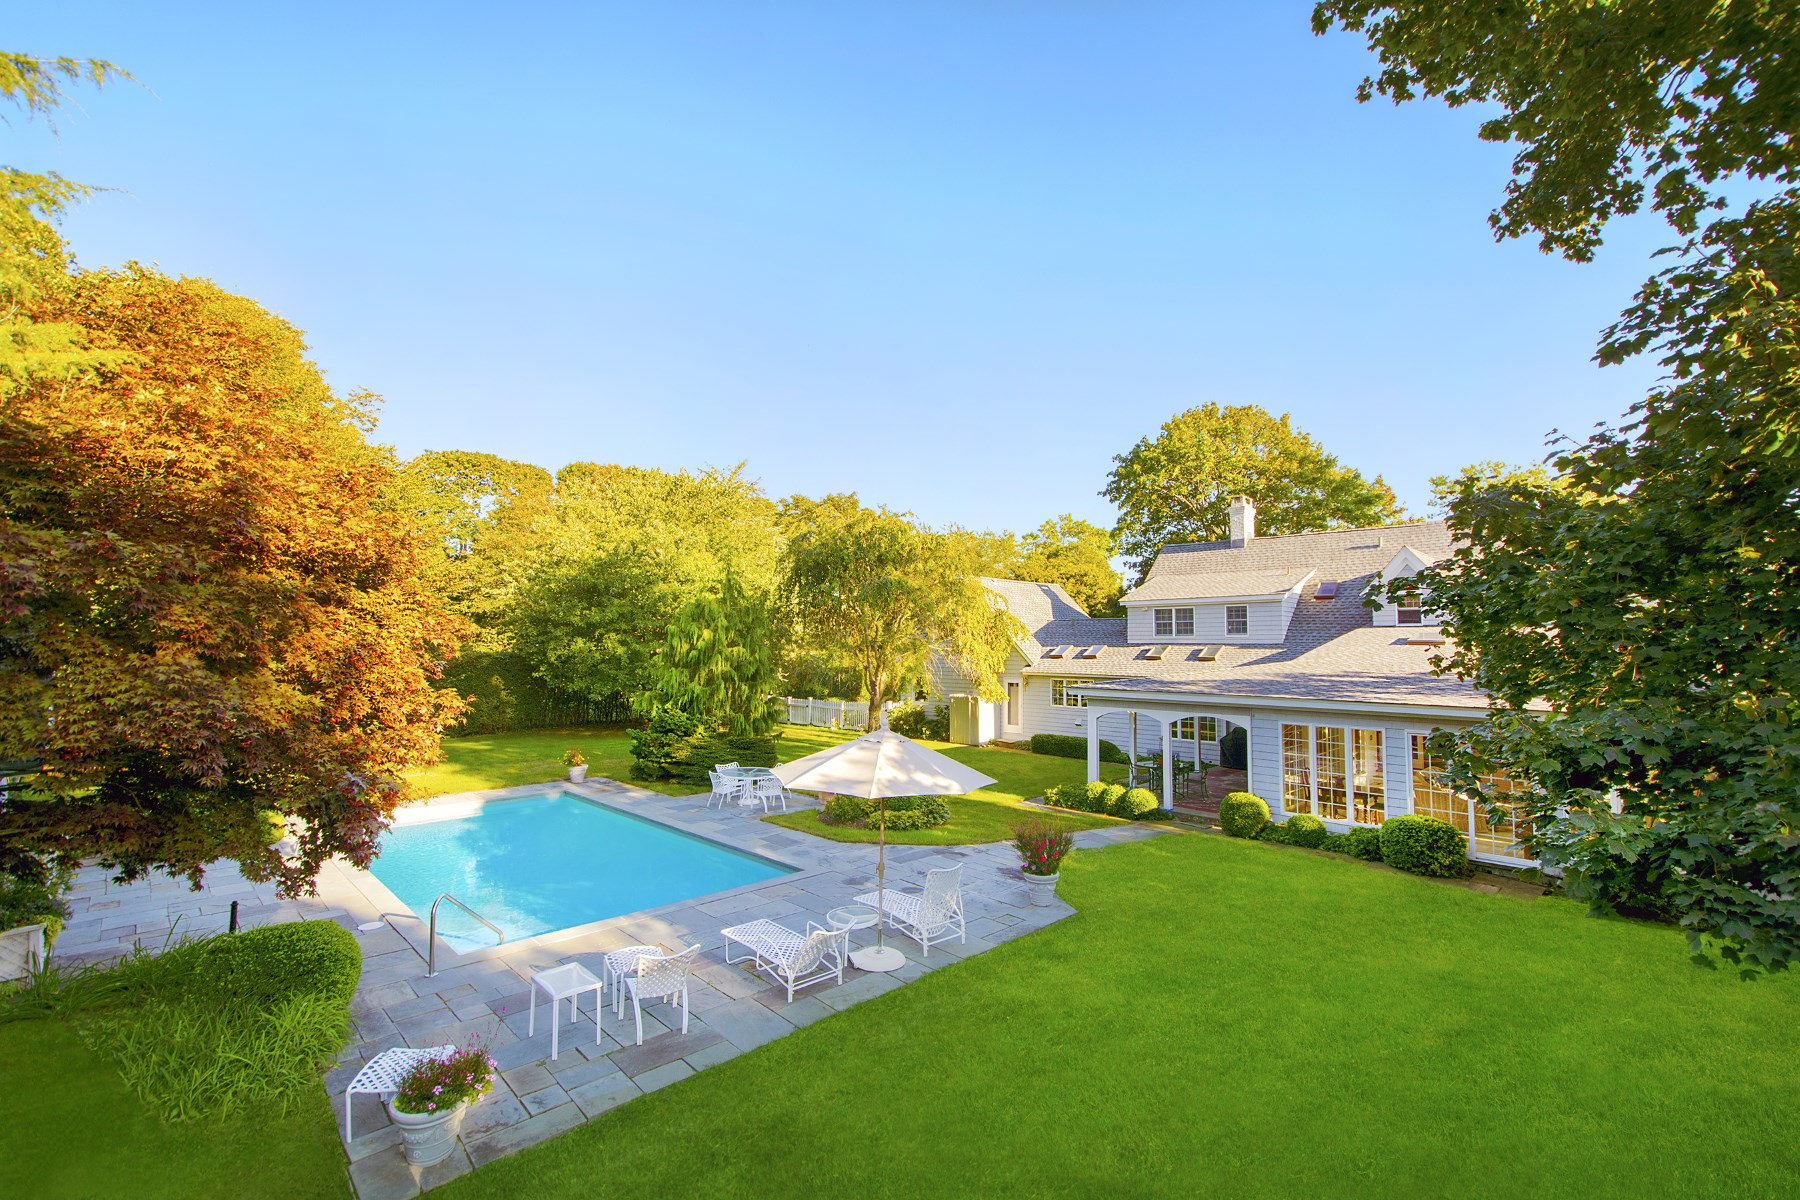 Single Family Home for Rent at Prime Location Southampton Village 35 Toylsome Lane Southampton, New York, 11968 United States